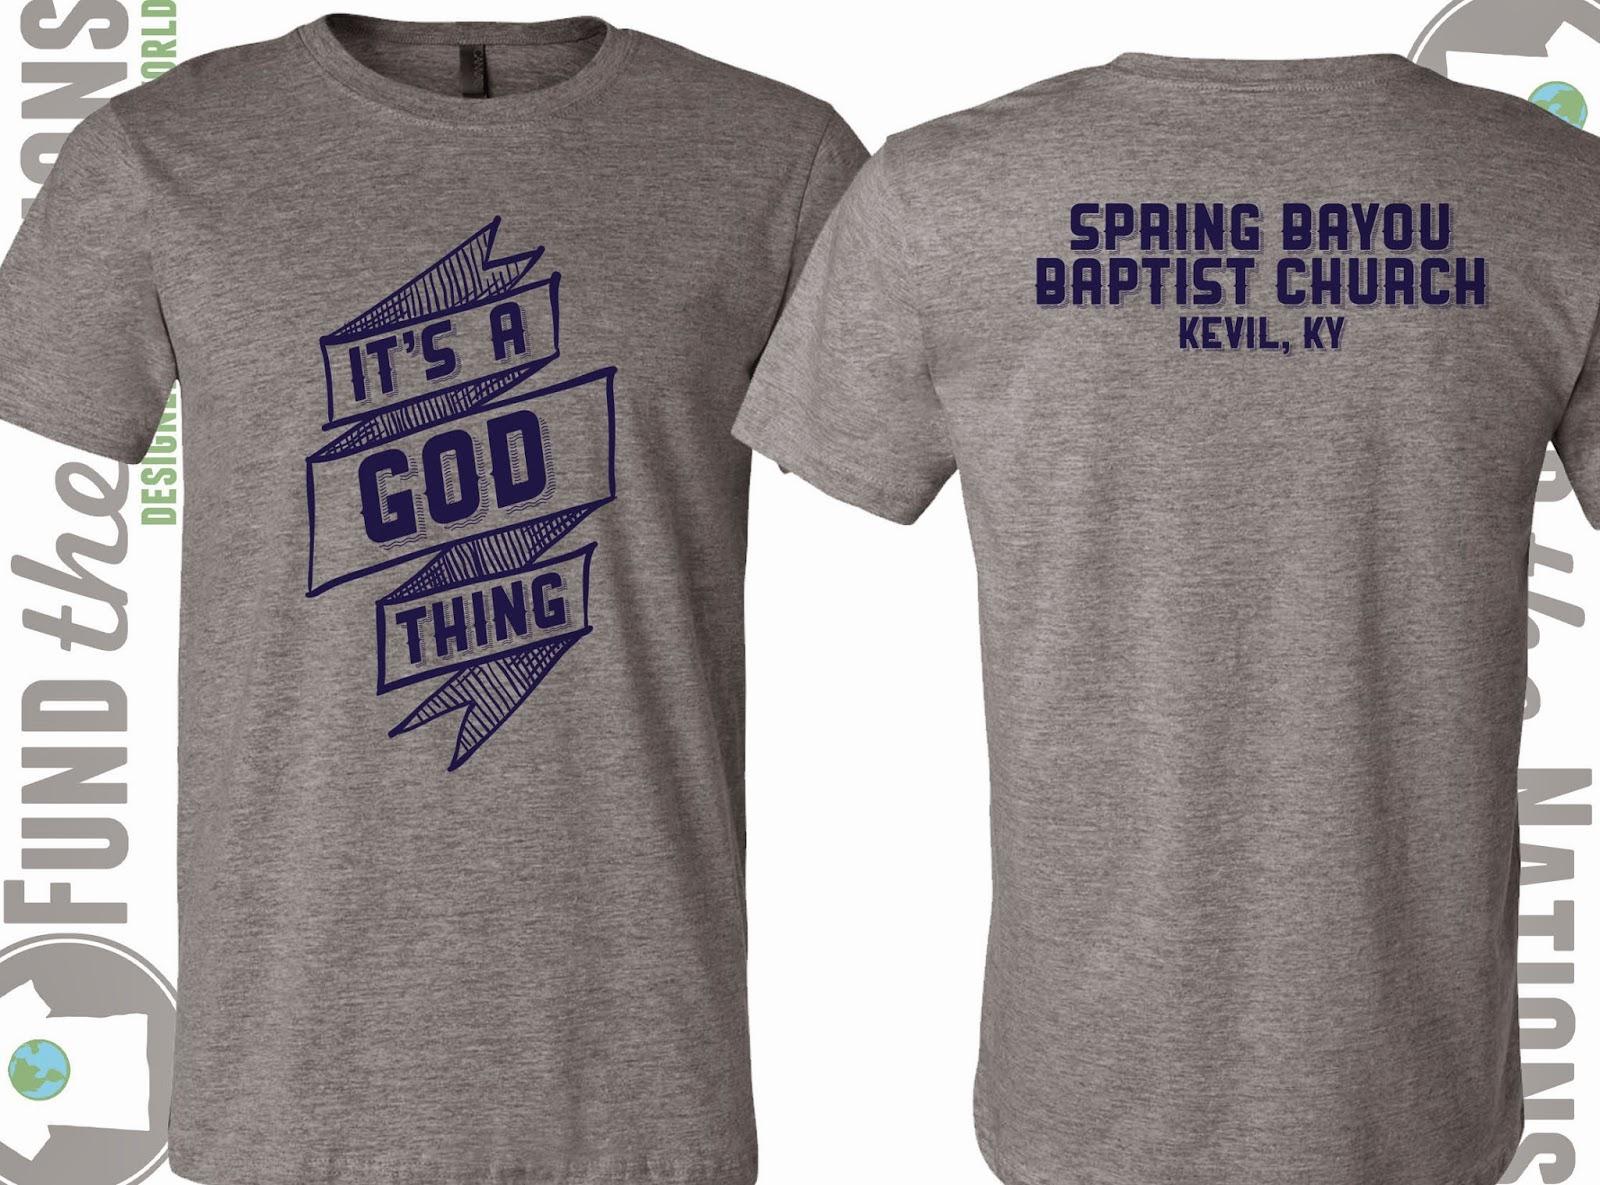 emejing t shirt design ideas for church contemporary amazing 120 - Church T Shirt Design Ideas